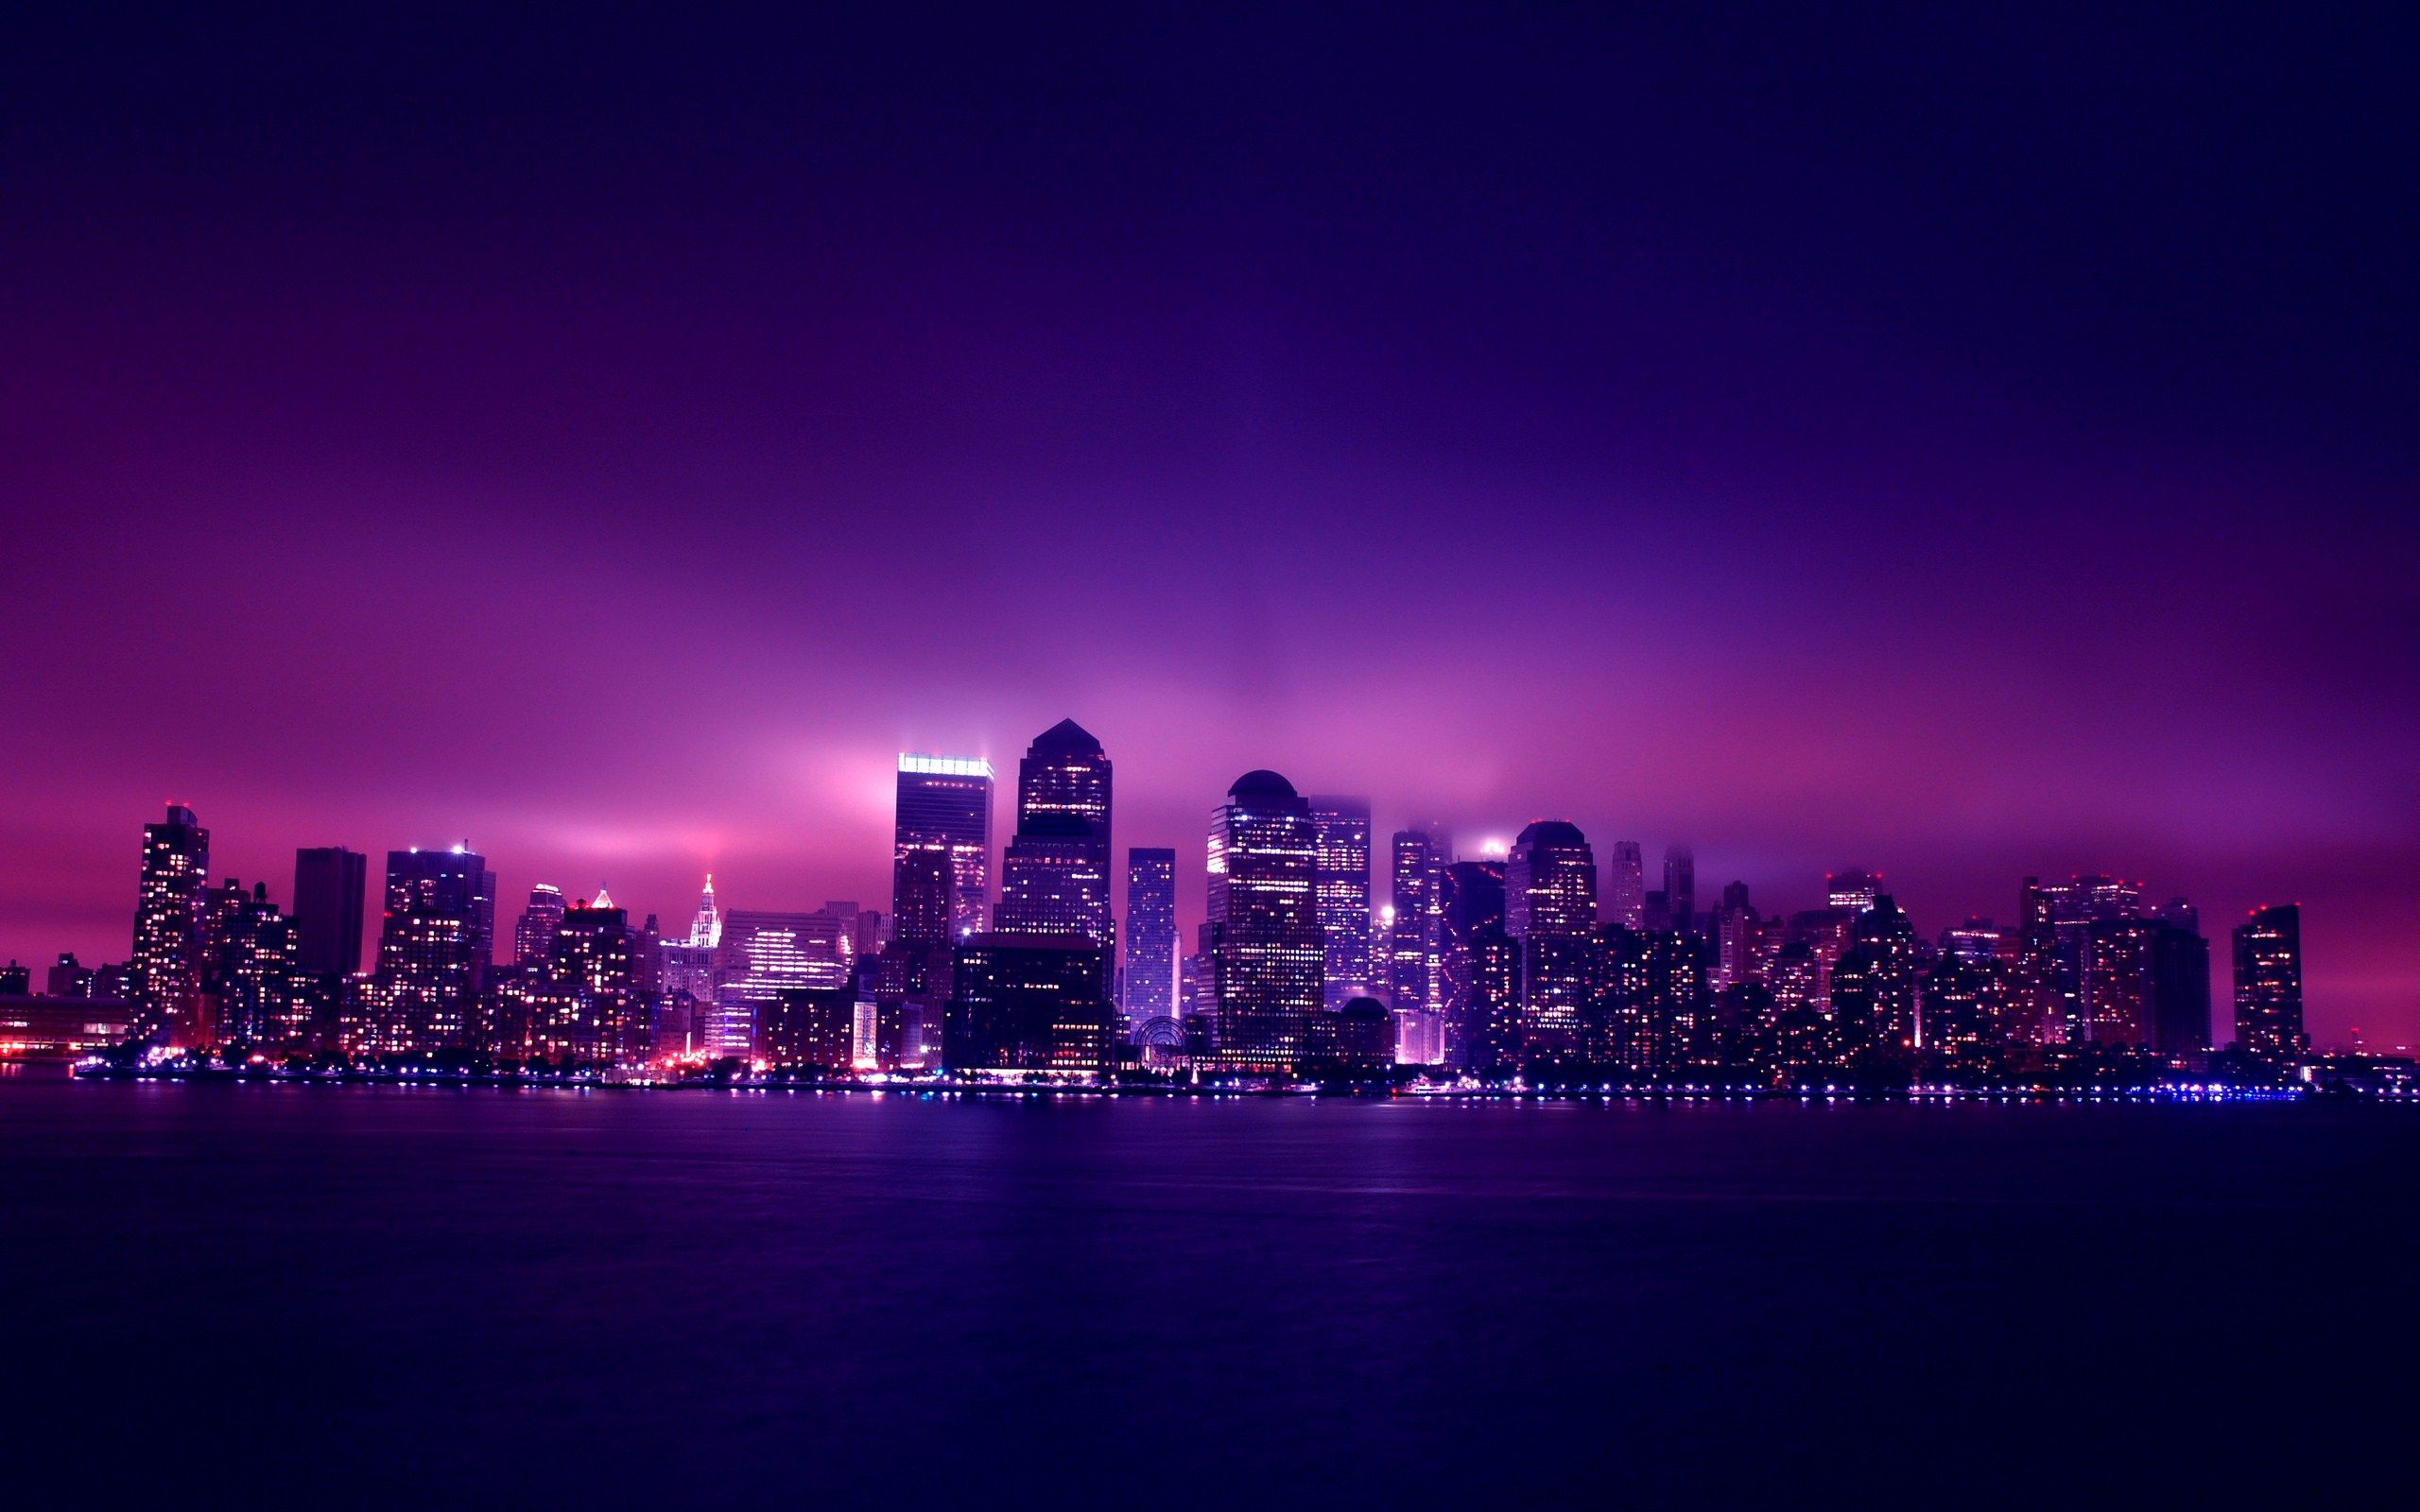 City Night Purple Purple City Night City City Wallpaper